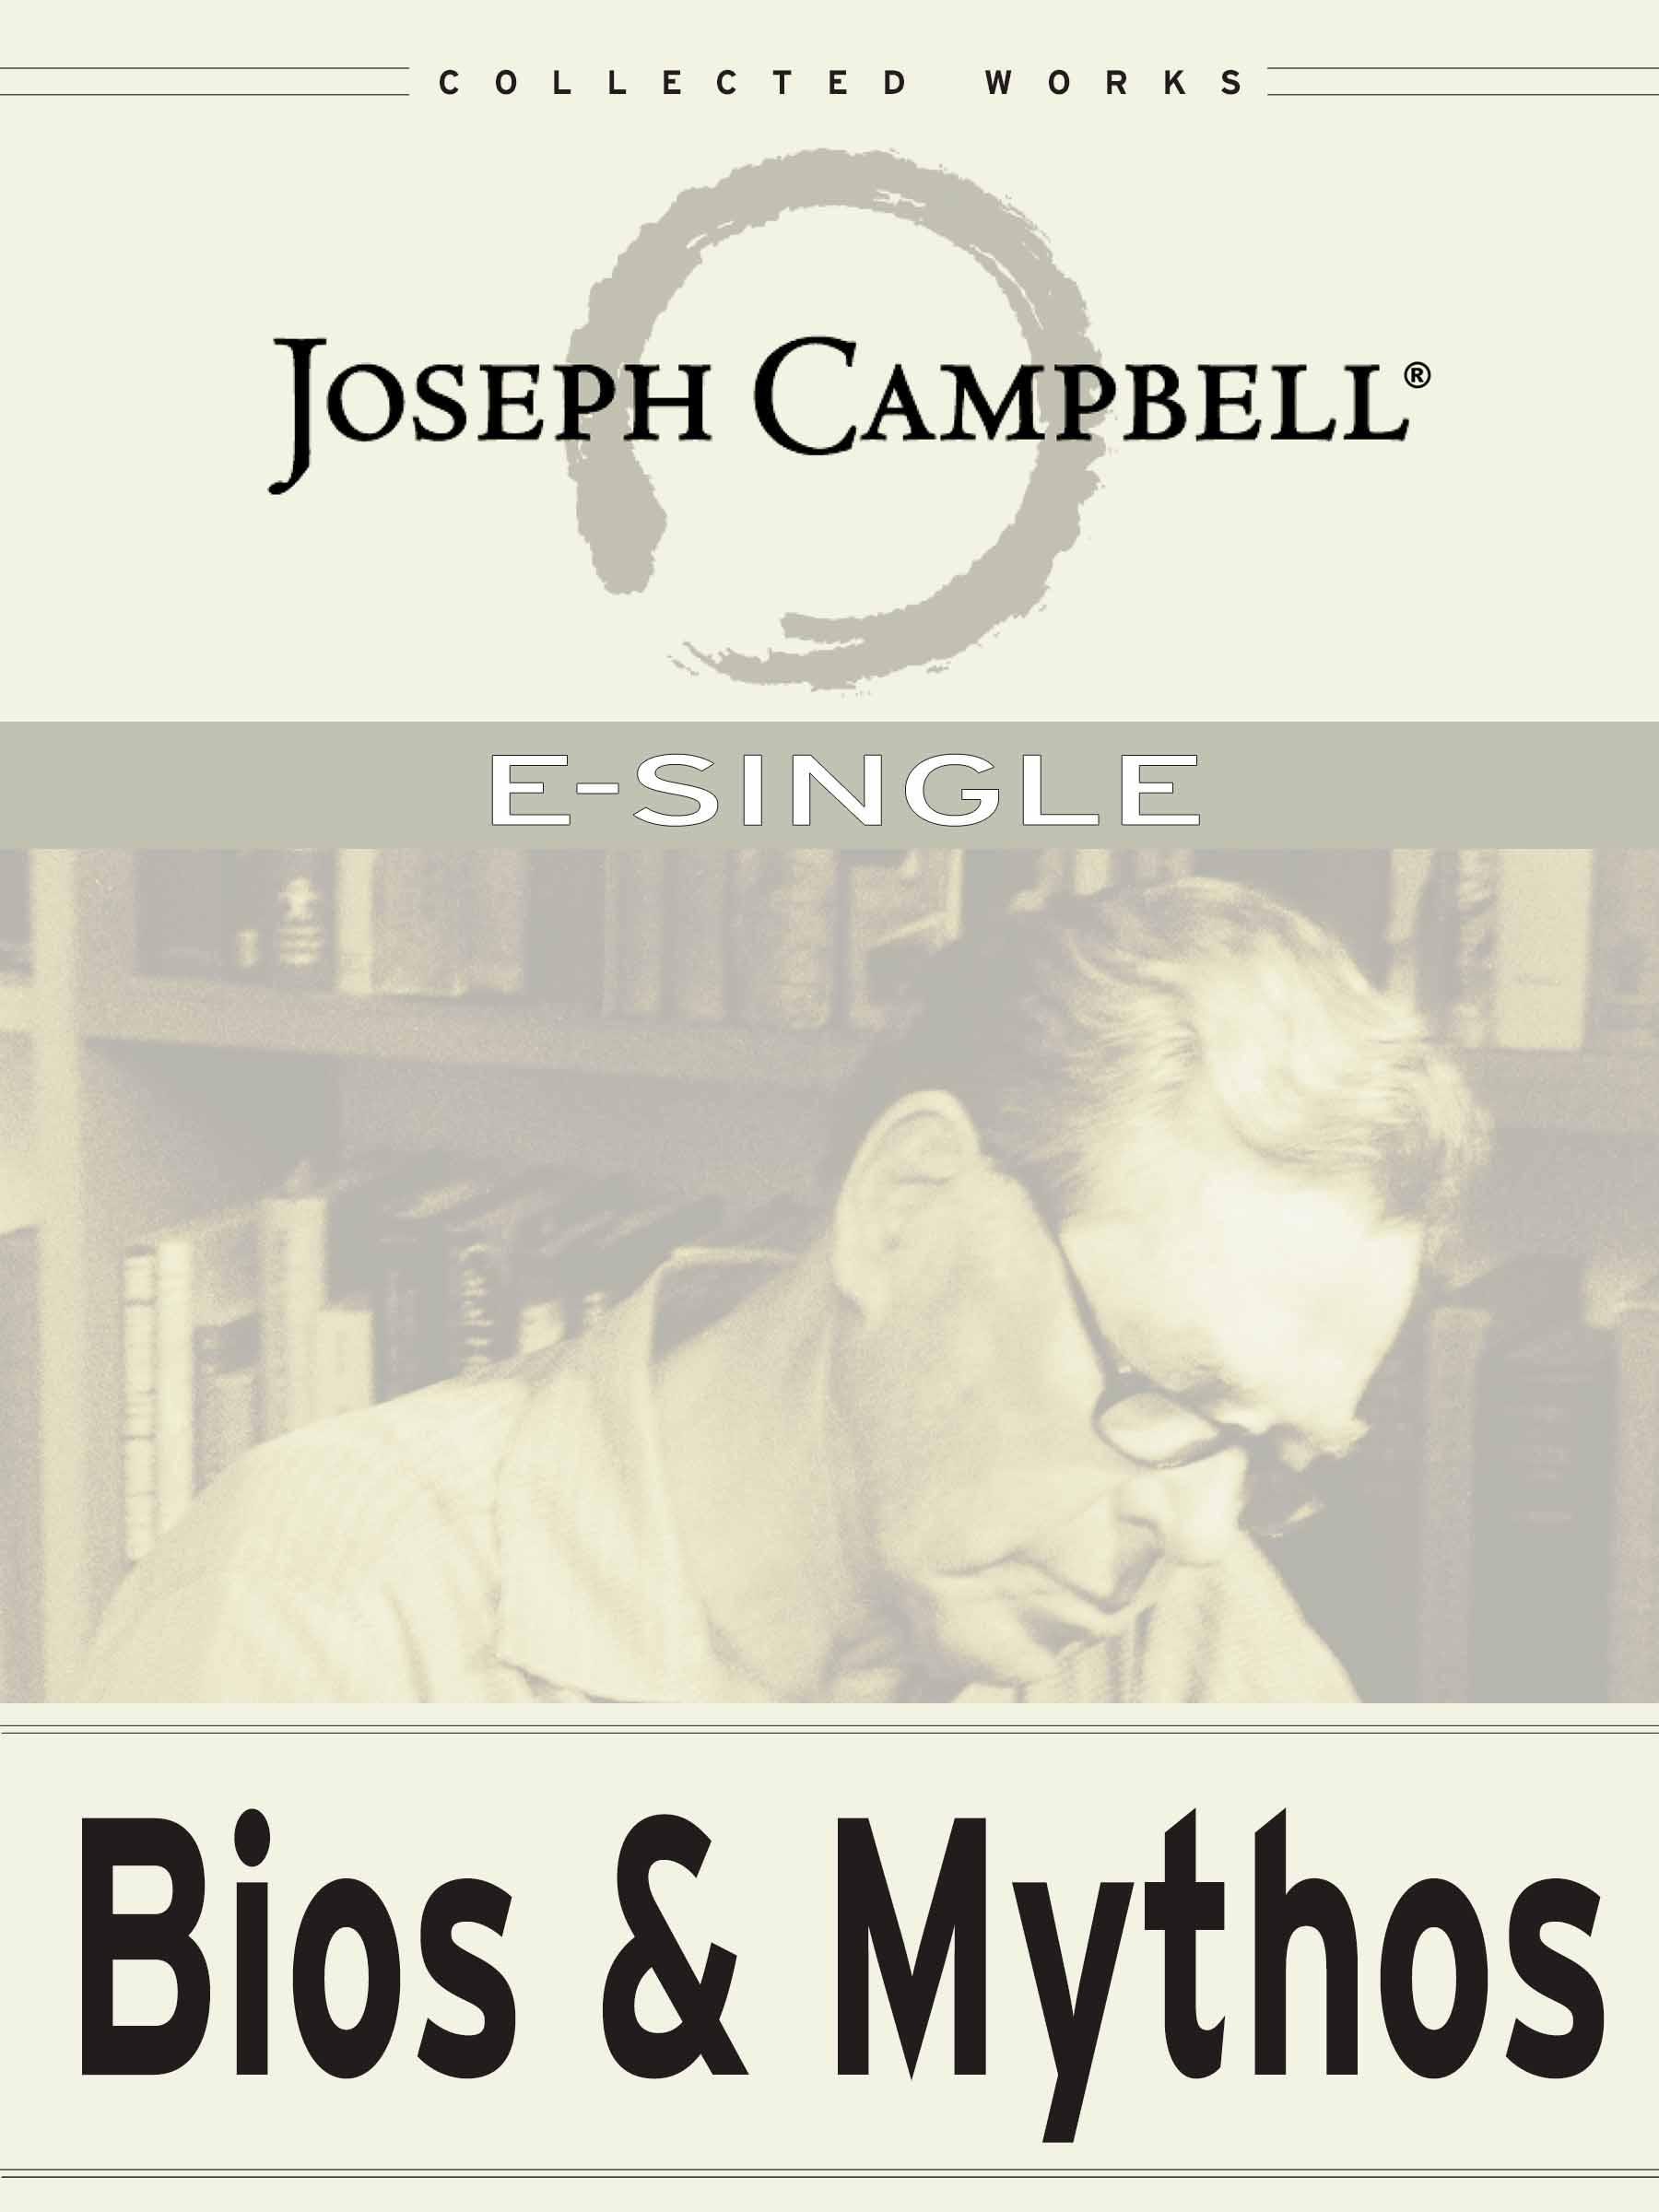 Bios & Mythos (Esingle)